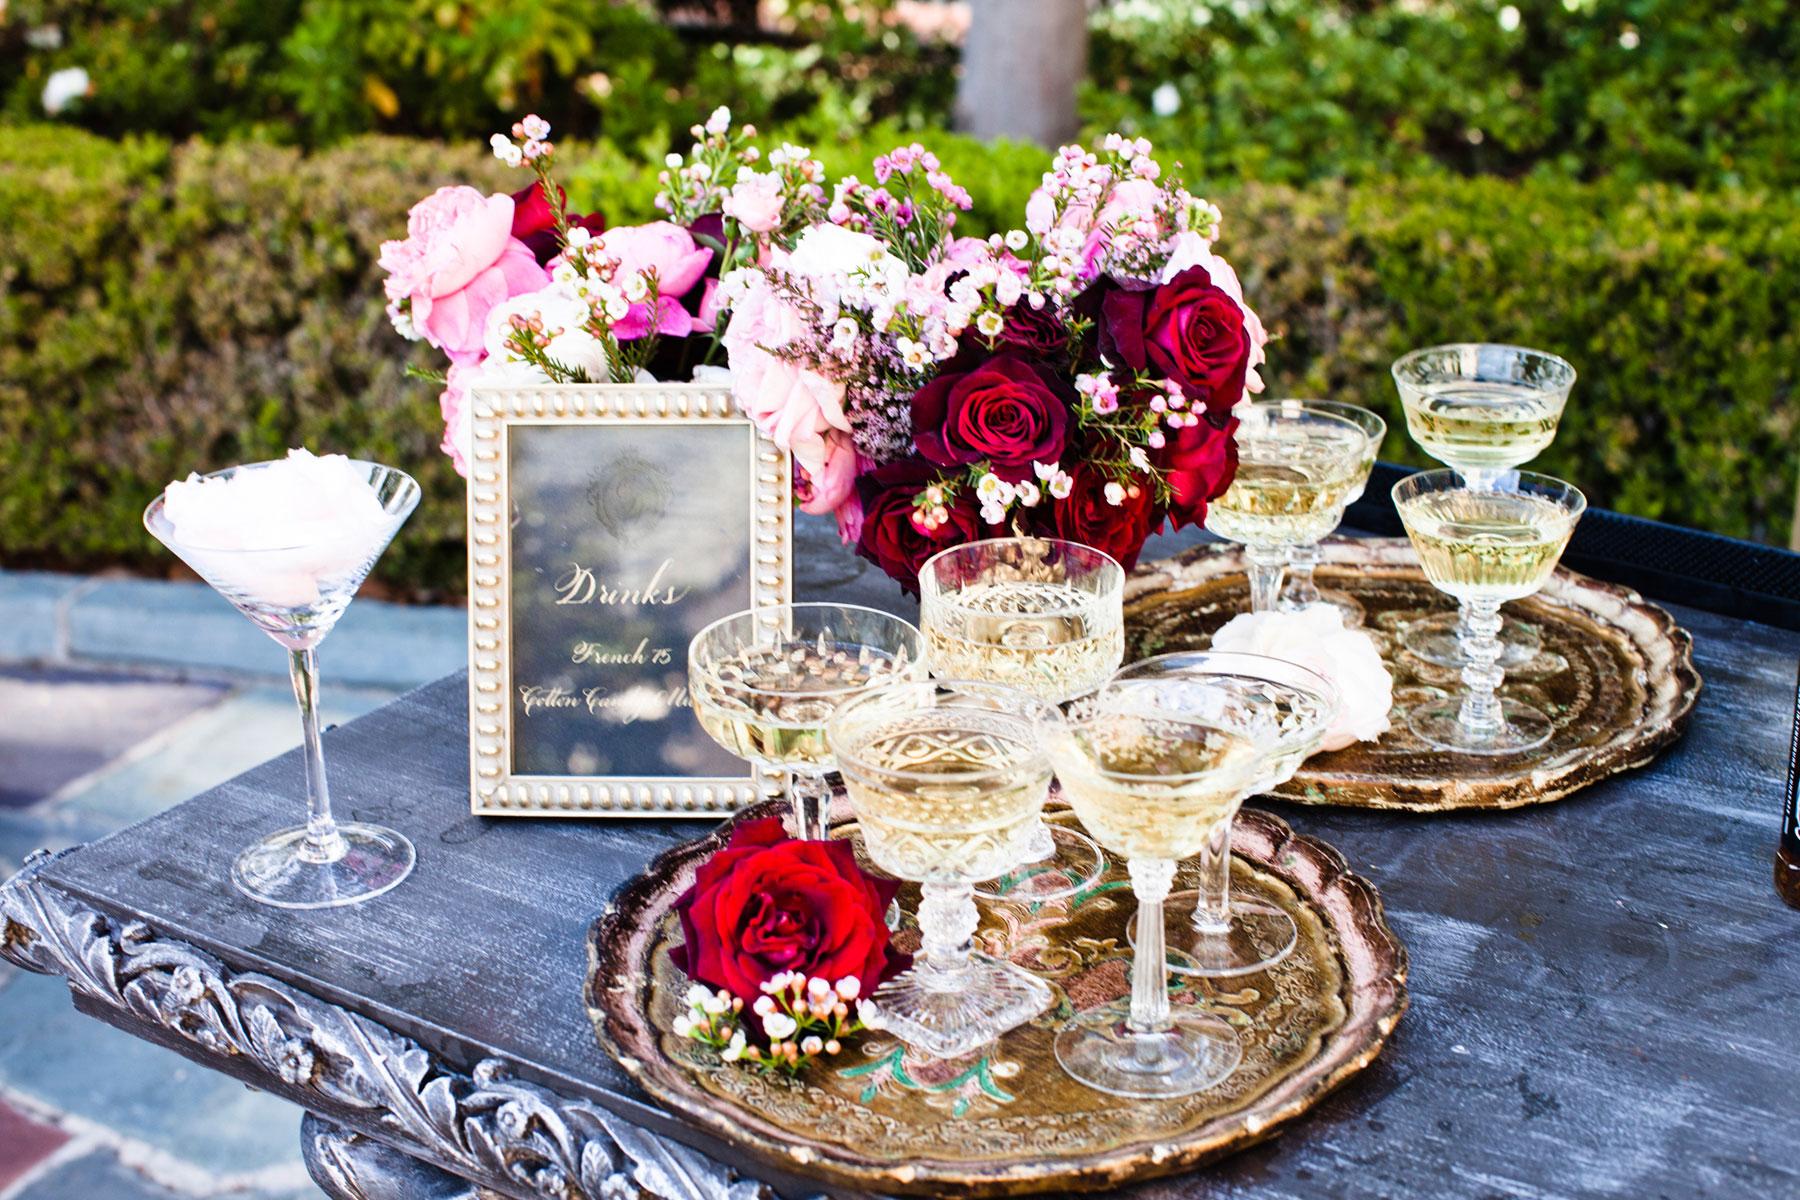 Nikki Sixx Motley Crue wedding champagne station